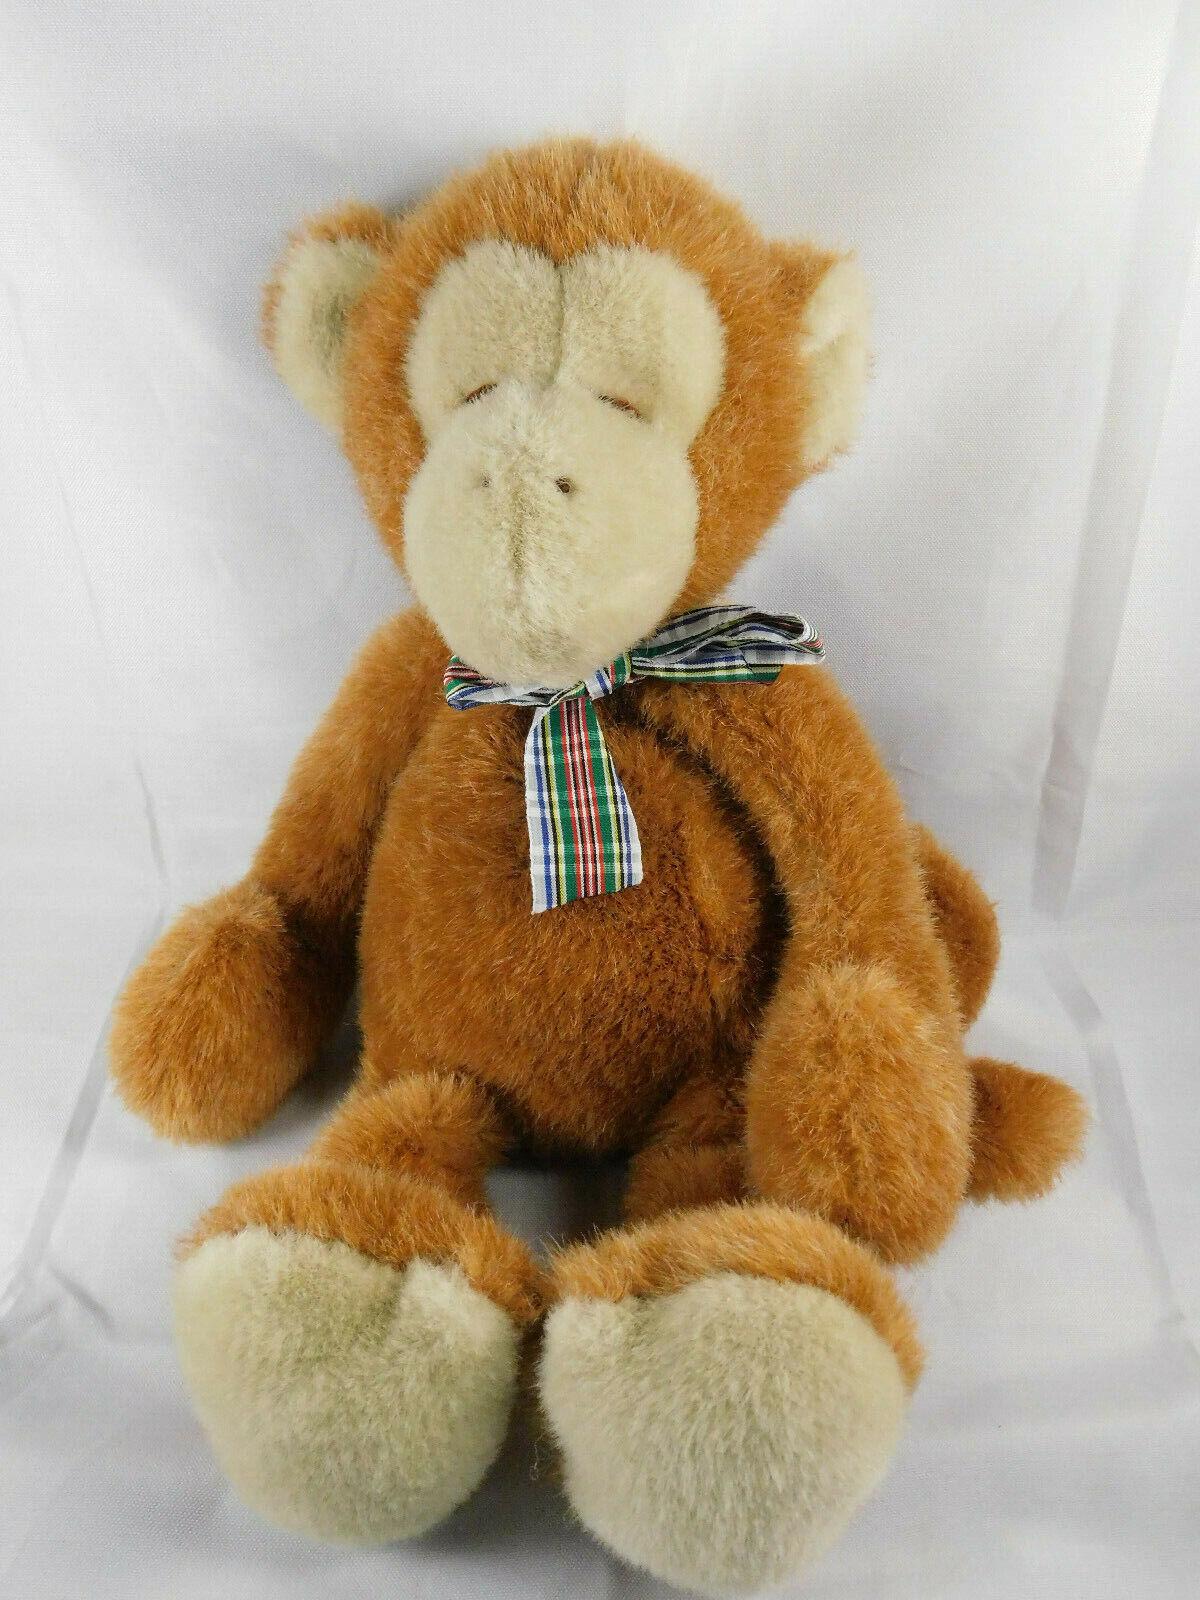 Manhattan Toy Company Monkey Vintage Plush 1987 Sleeping Marronee Tan 18  Tall